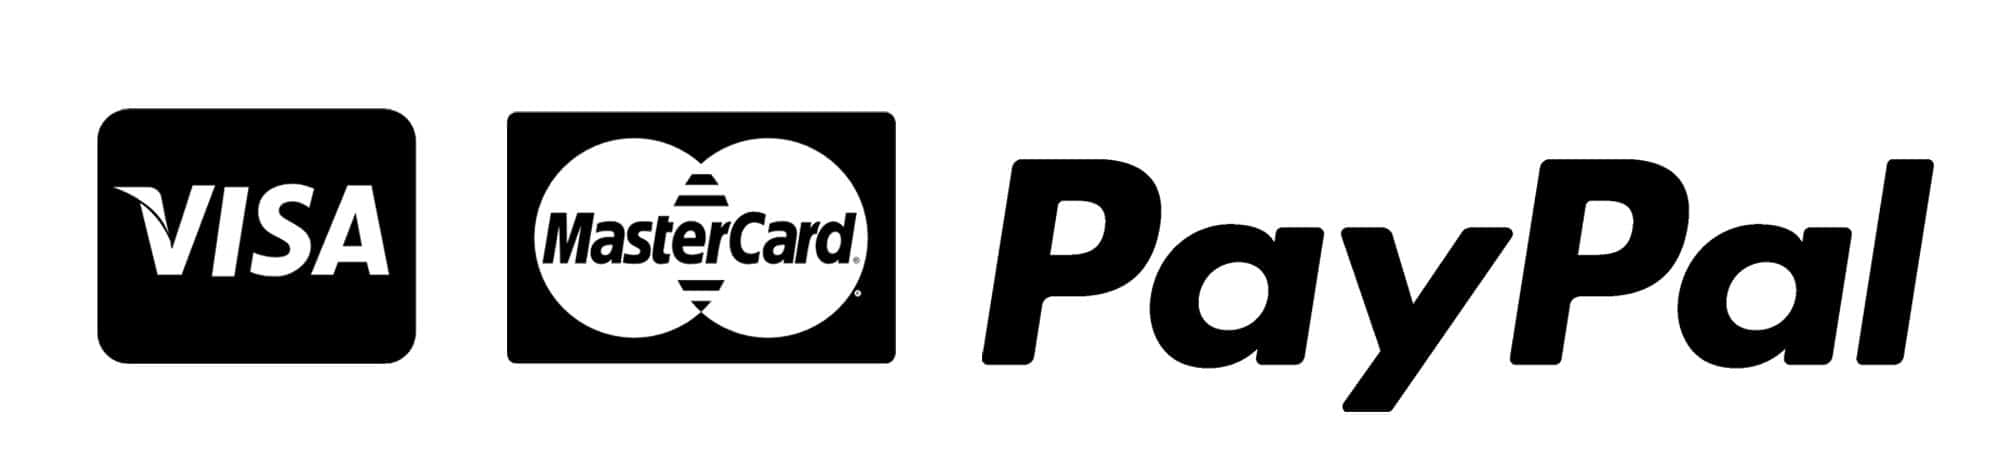 PayPal Doner knapp